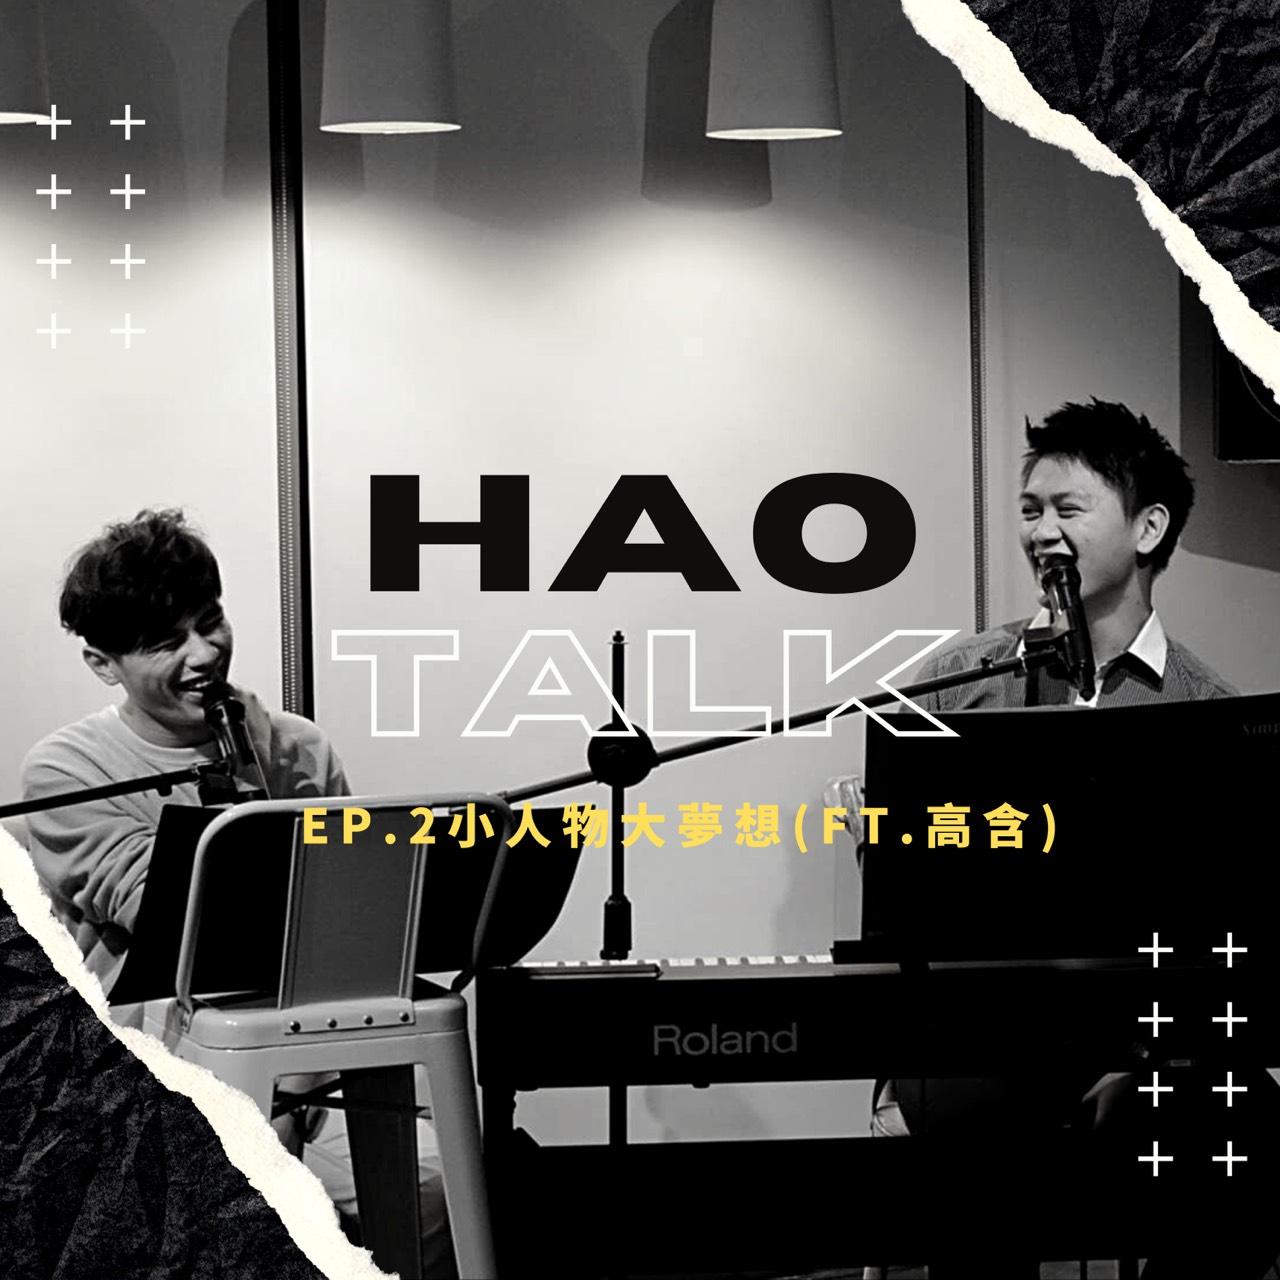 EP.2 小人物大夢想(ft.高含)